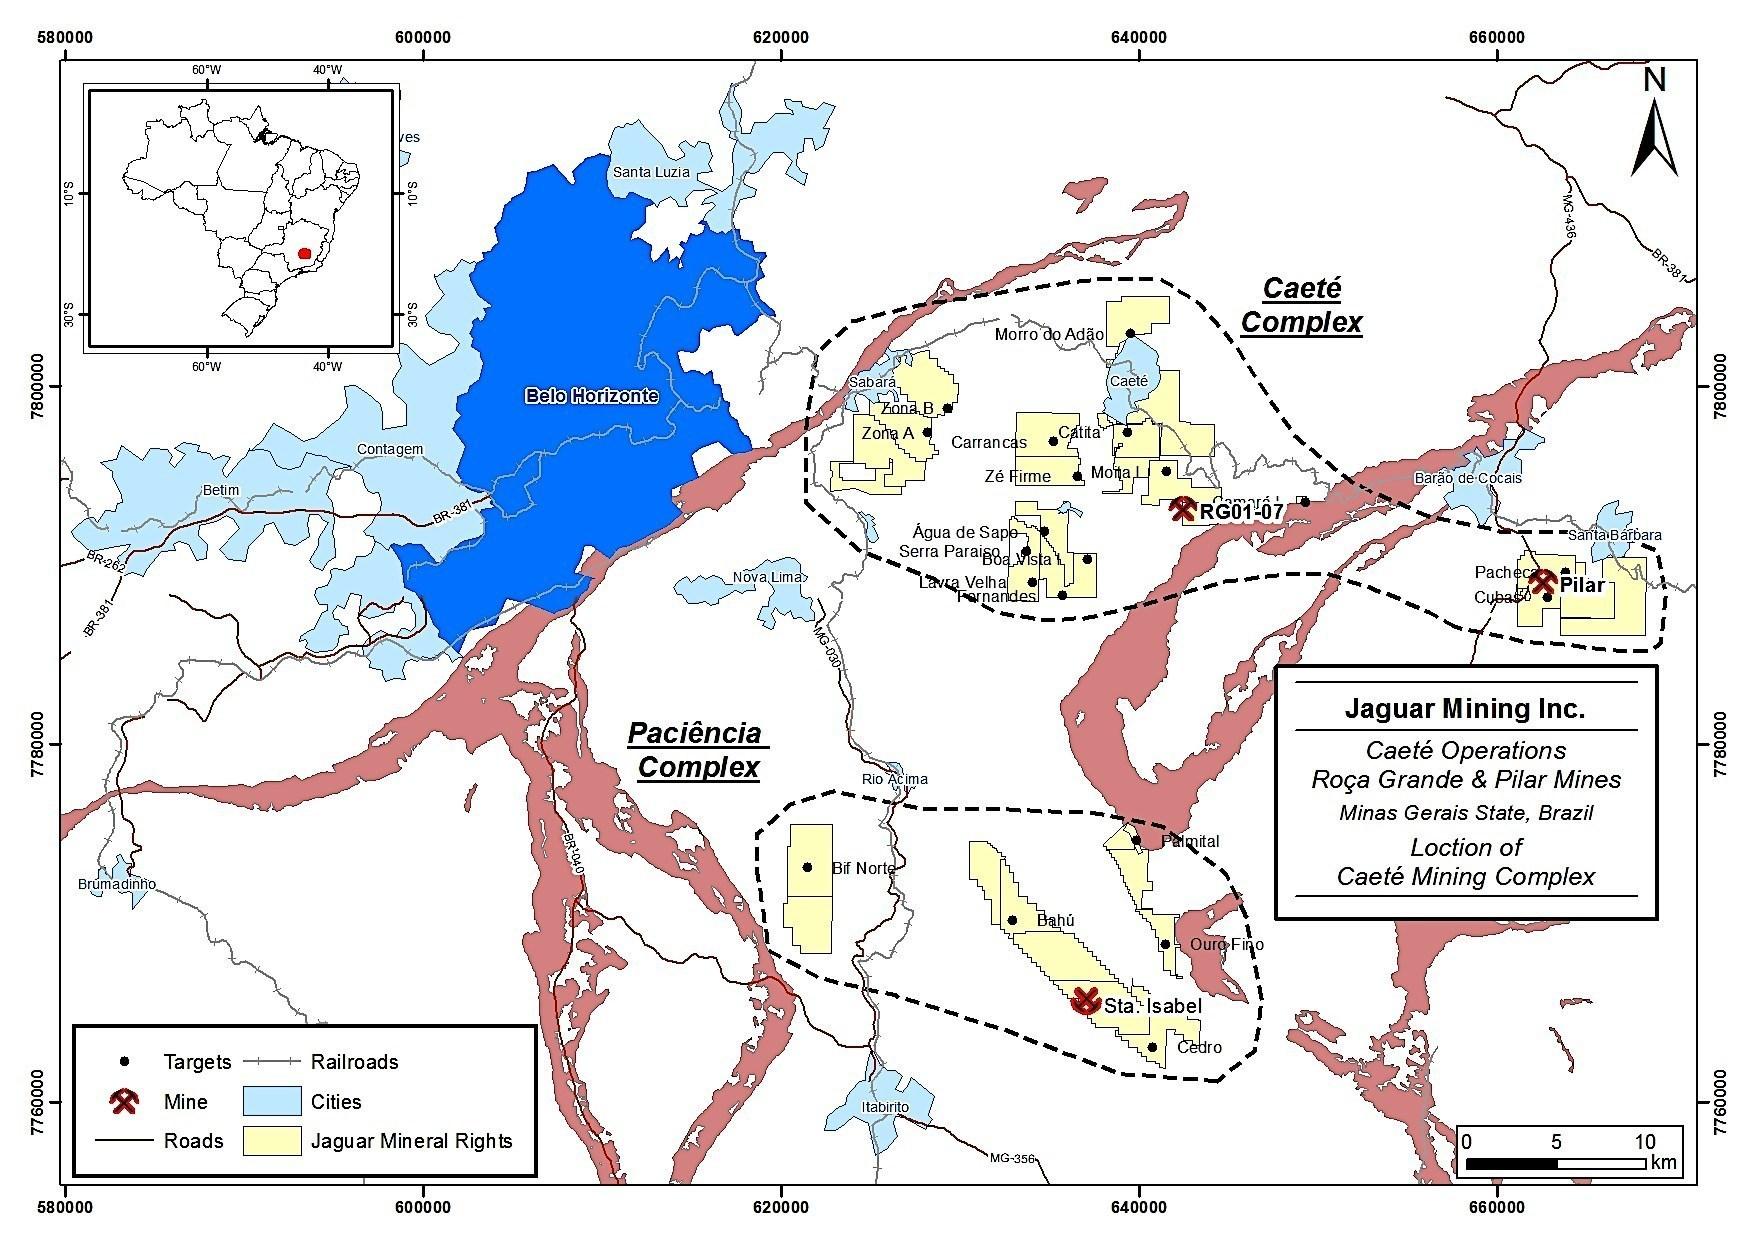 Figure 2 - Caete Complex Location Map (PRNewsFoto/Jaguar Mining Inc.)